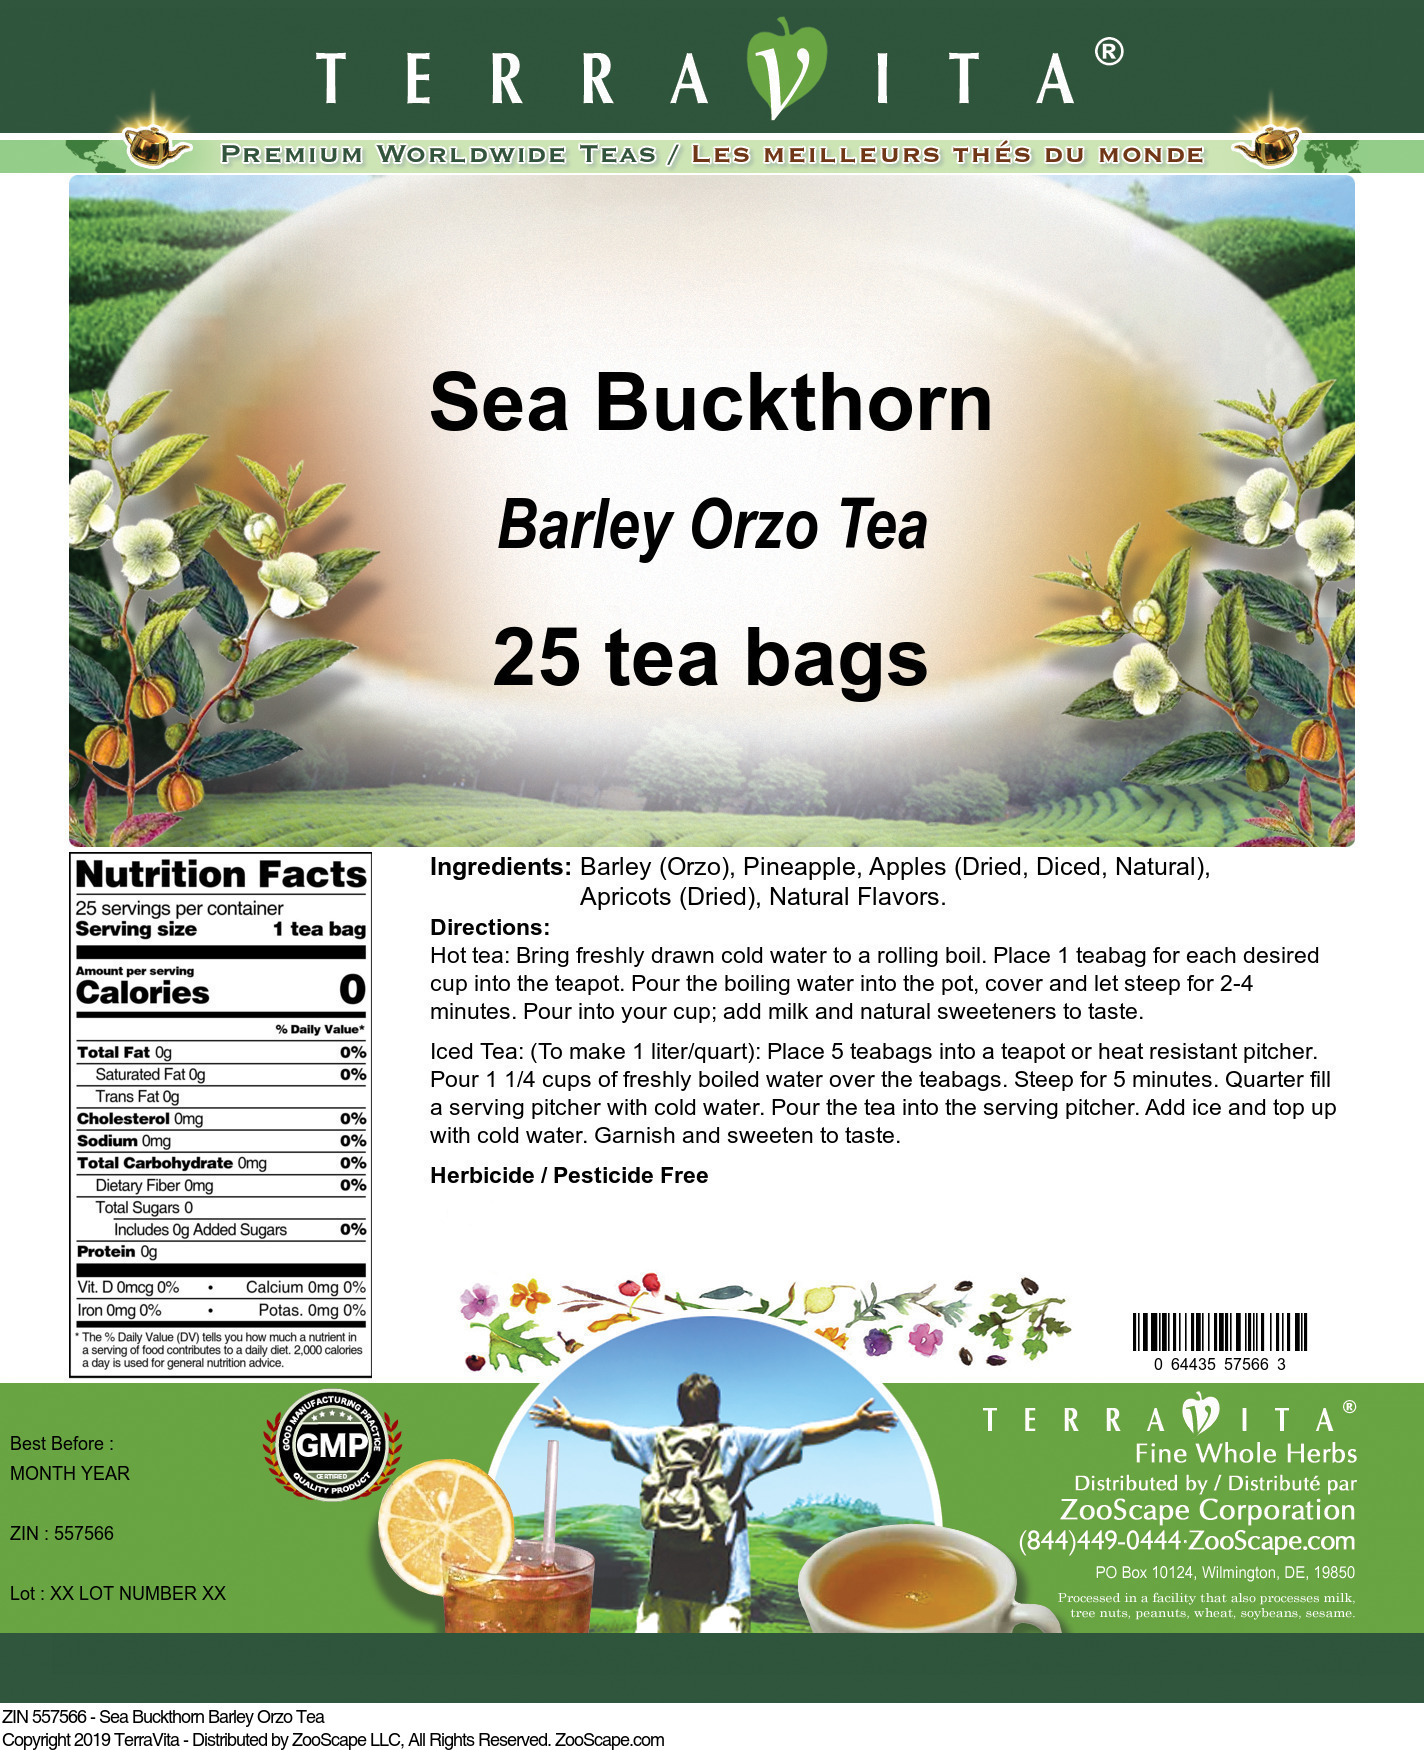 Sea Buckthorn Barley Orzo